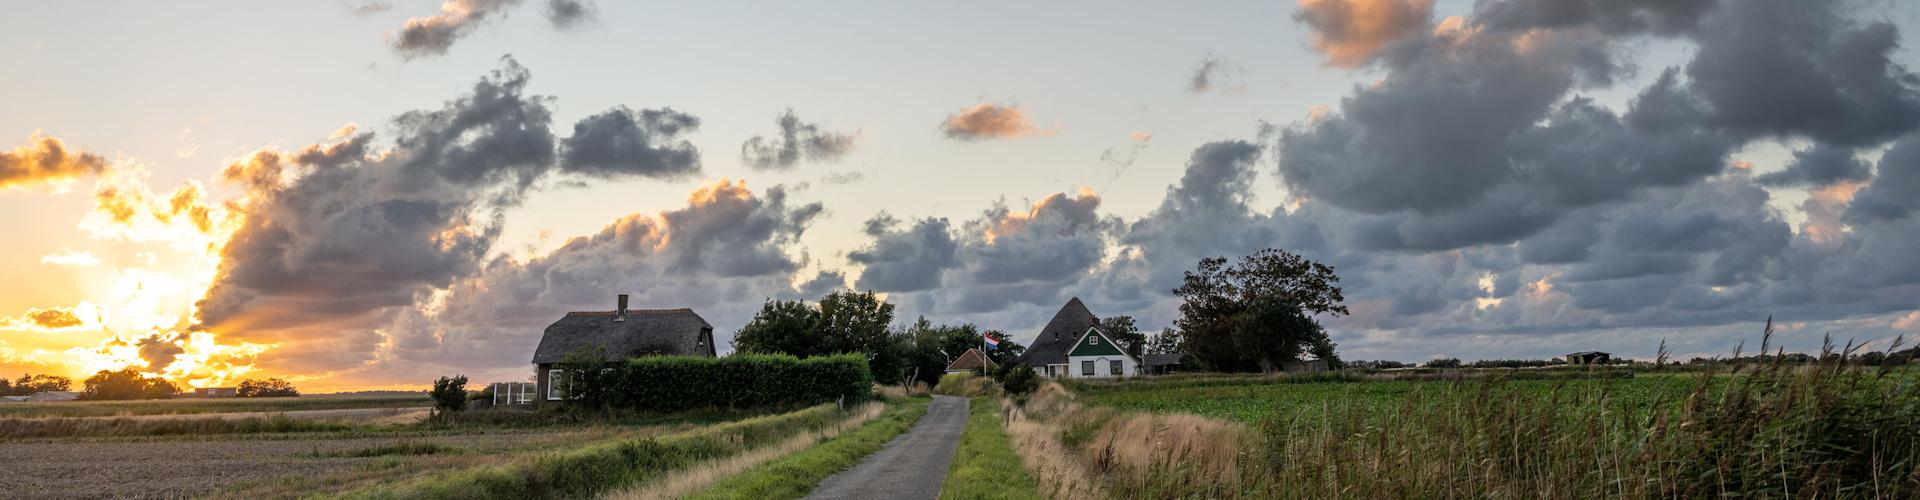 Bargerhof Texel